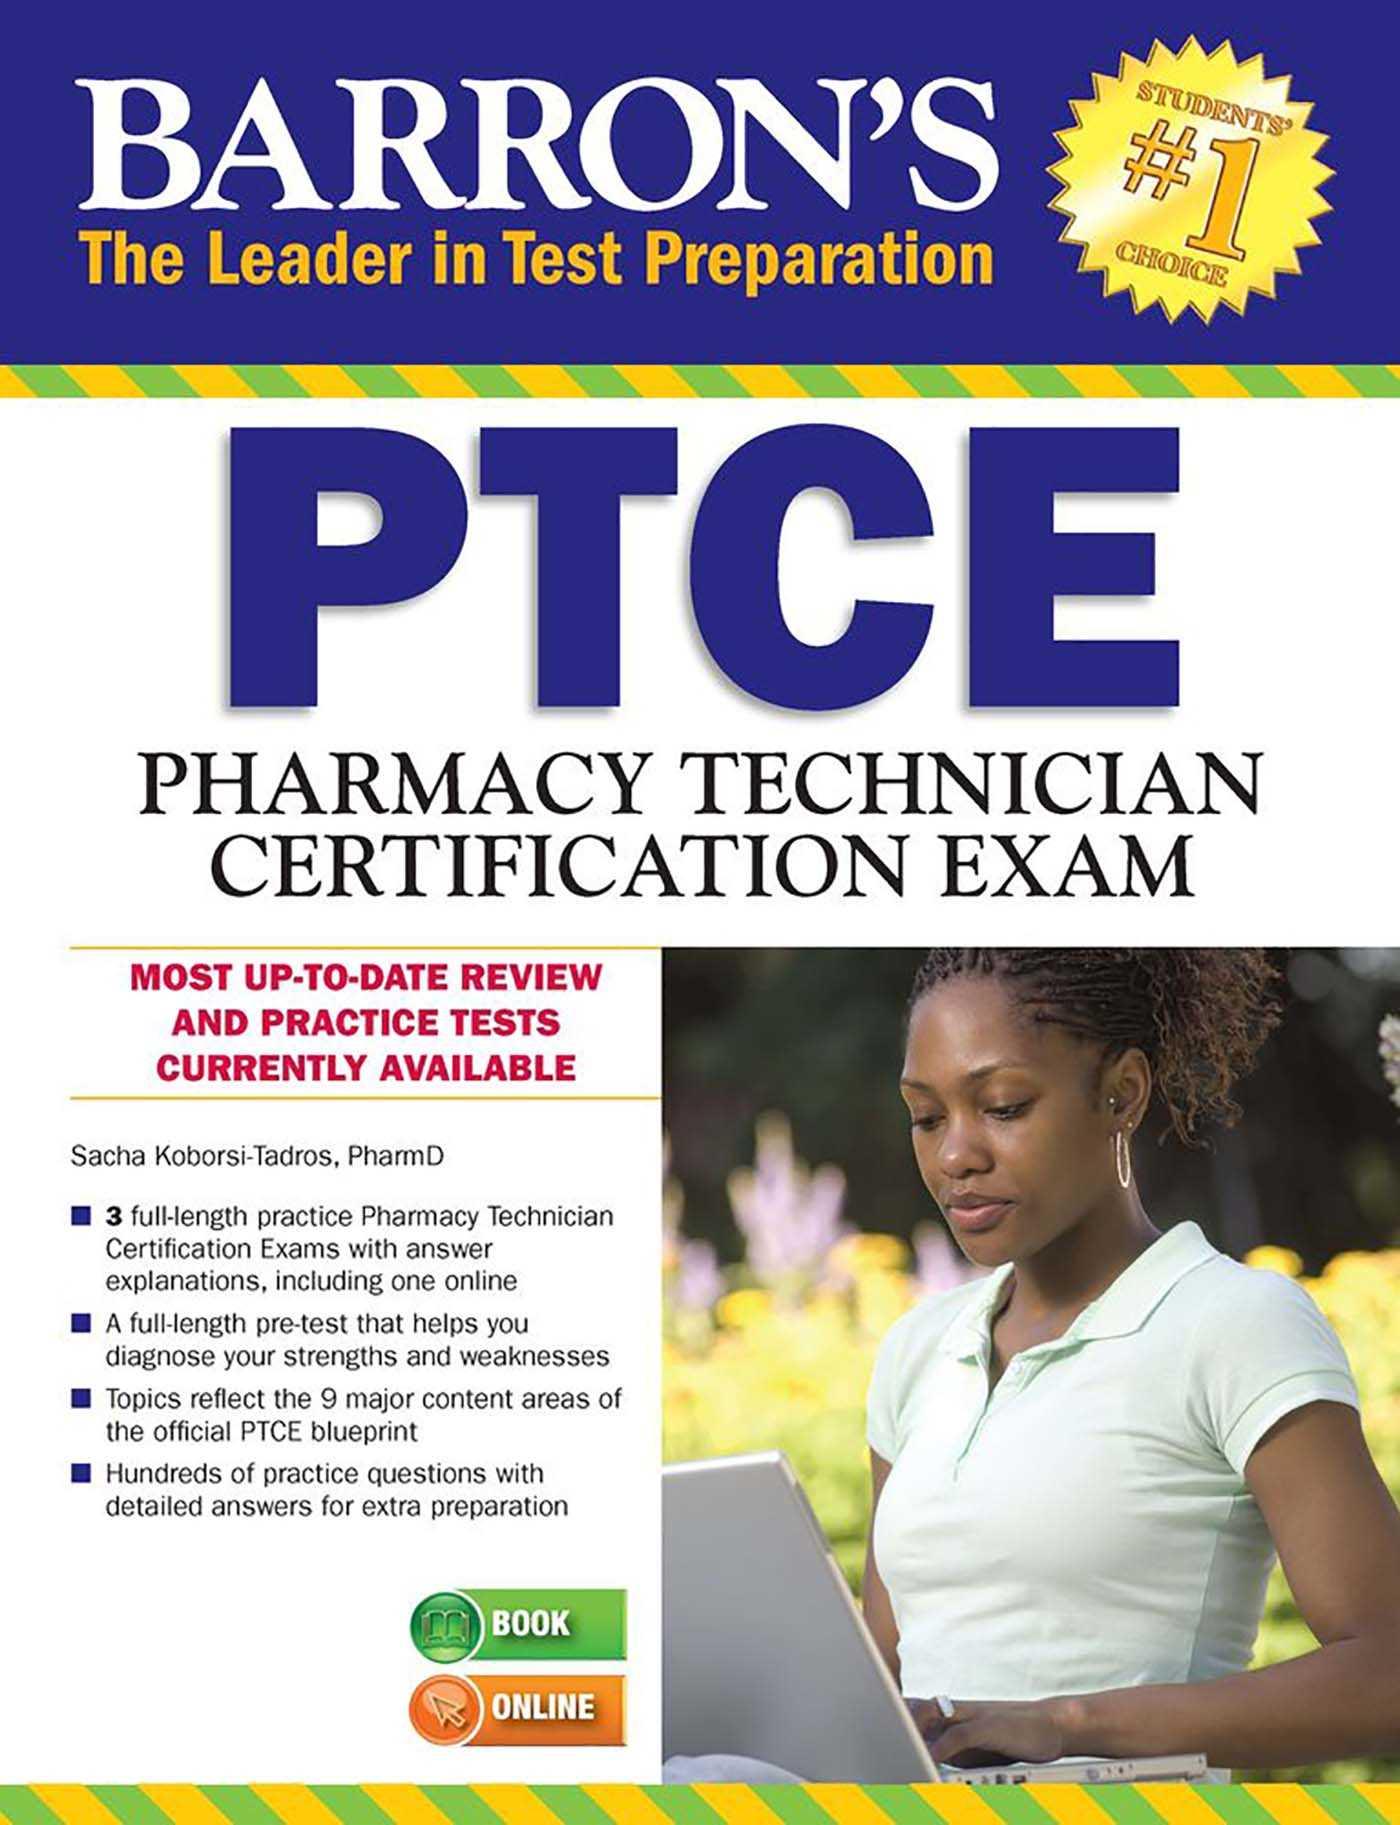 Barrons Ptcepharmacy Technician Certification Exam Book By Sacha